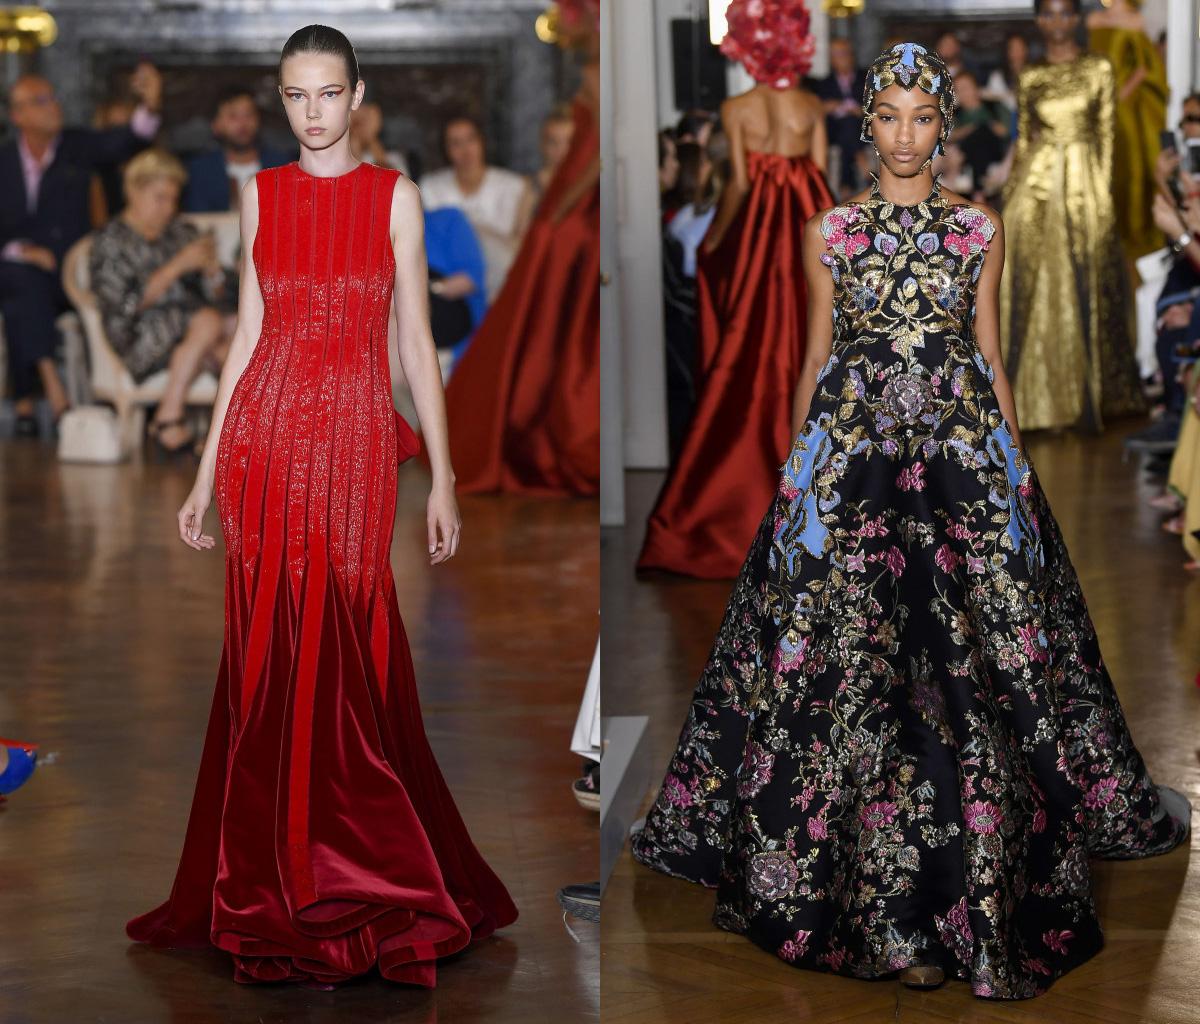 b84bc59de9f Фото Вечерние платья Валентино из коллекции Valentino Fall Couture 2018 на  осень 2019